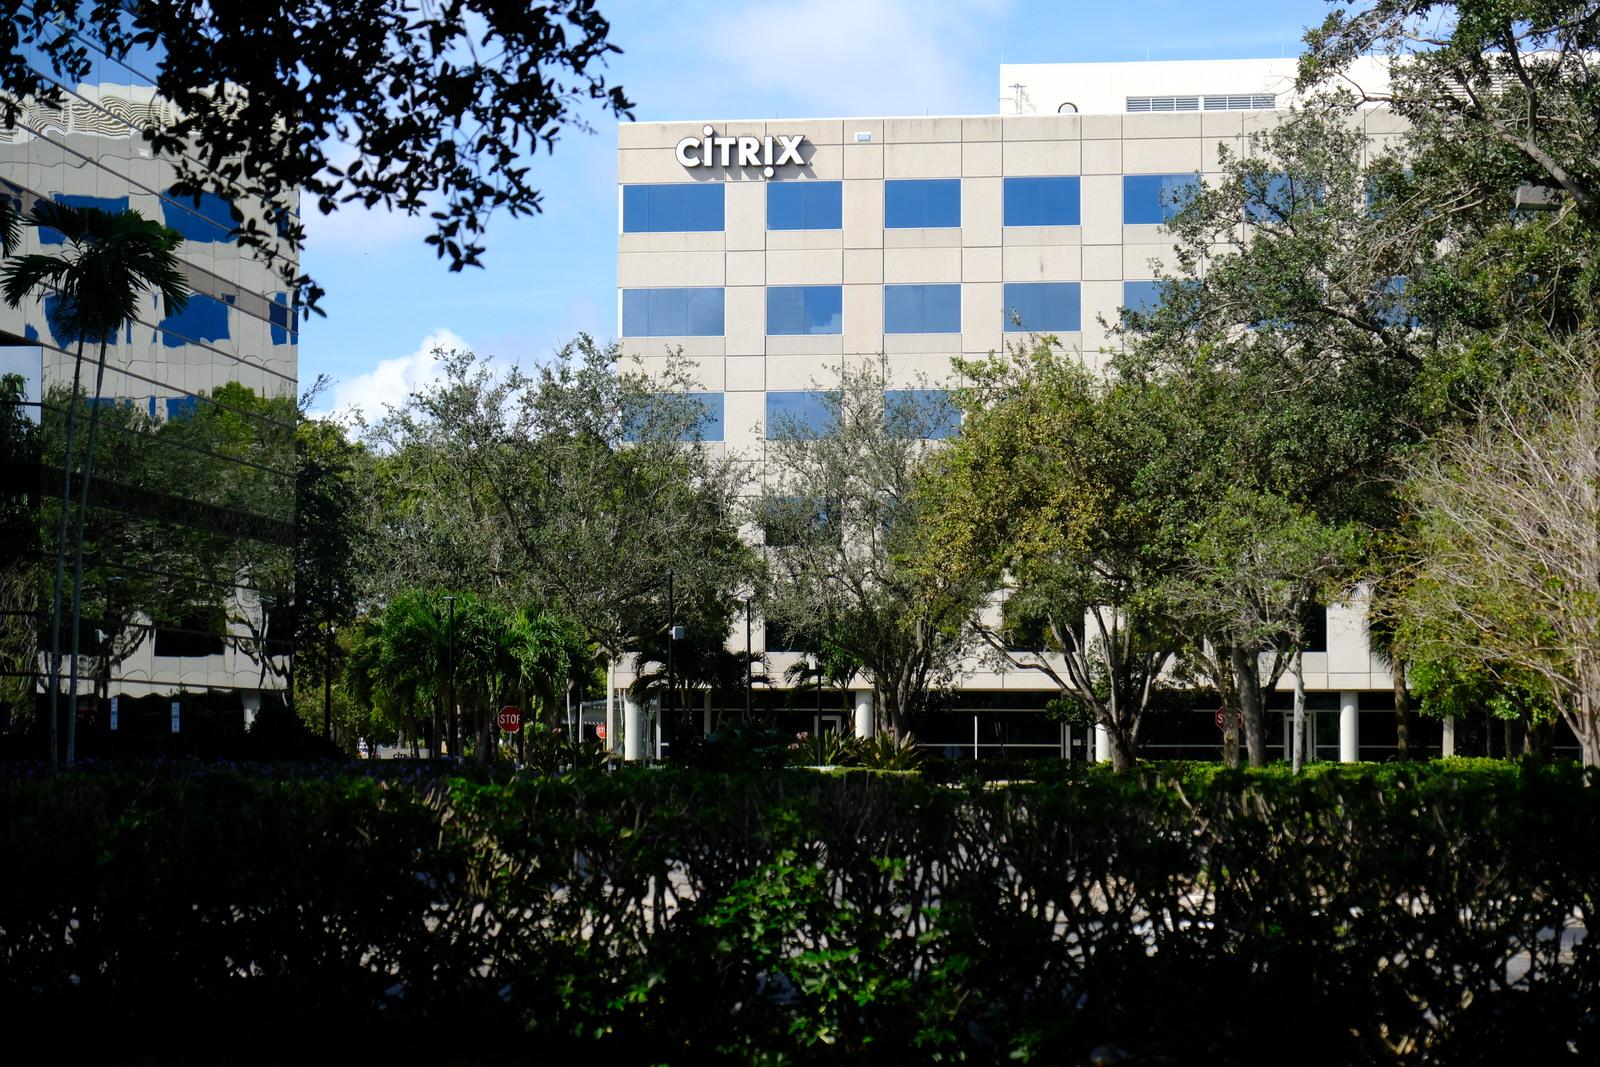 Citrix System's corporate headquarters in Fort Lauderdale, Florida.